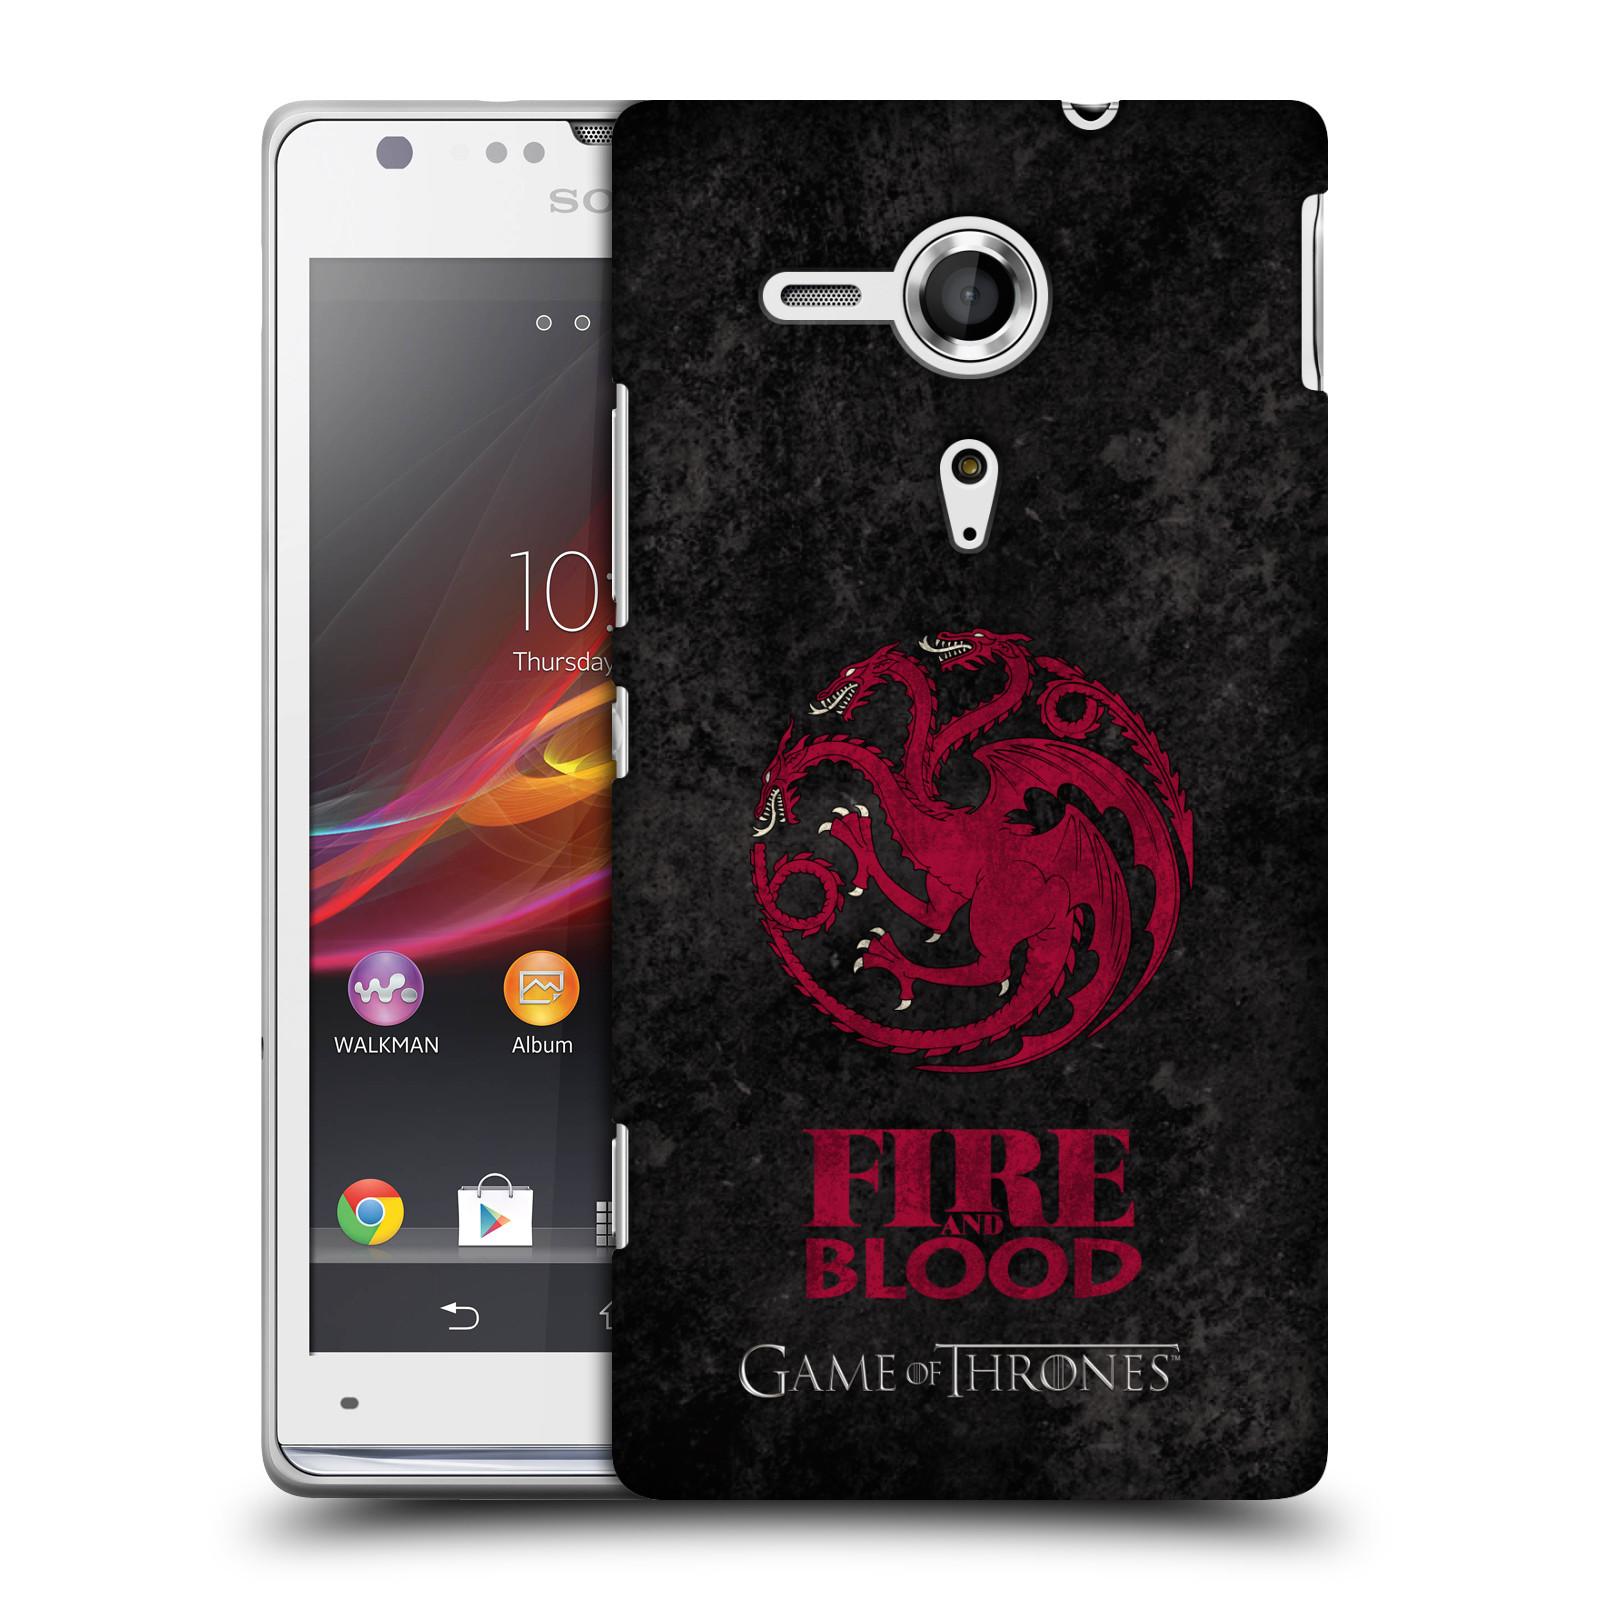 Plastové pouzdro na mobil Sony Xperia SP C5303 HEAD CASE Hra o trůny - Sigils Targaryen - Fire and Blood (Plastový kryt či obal na mobilní telefon s licencovaným motivem Hra o trůny - Game Of Thrones pro Sony Xperia SP)